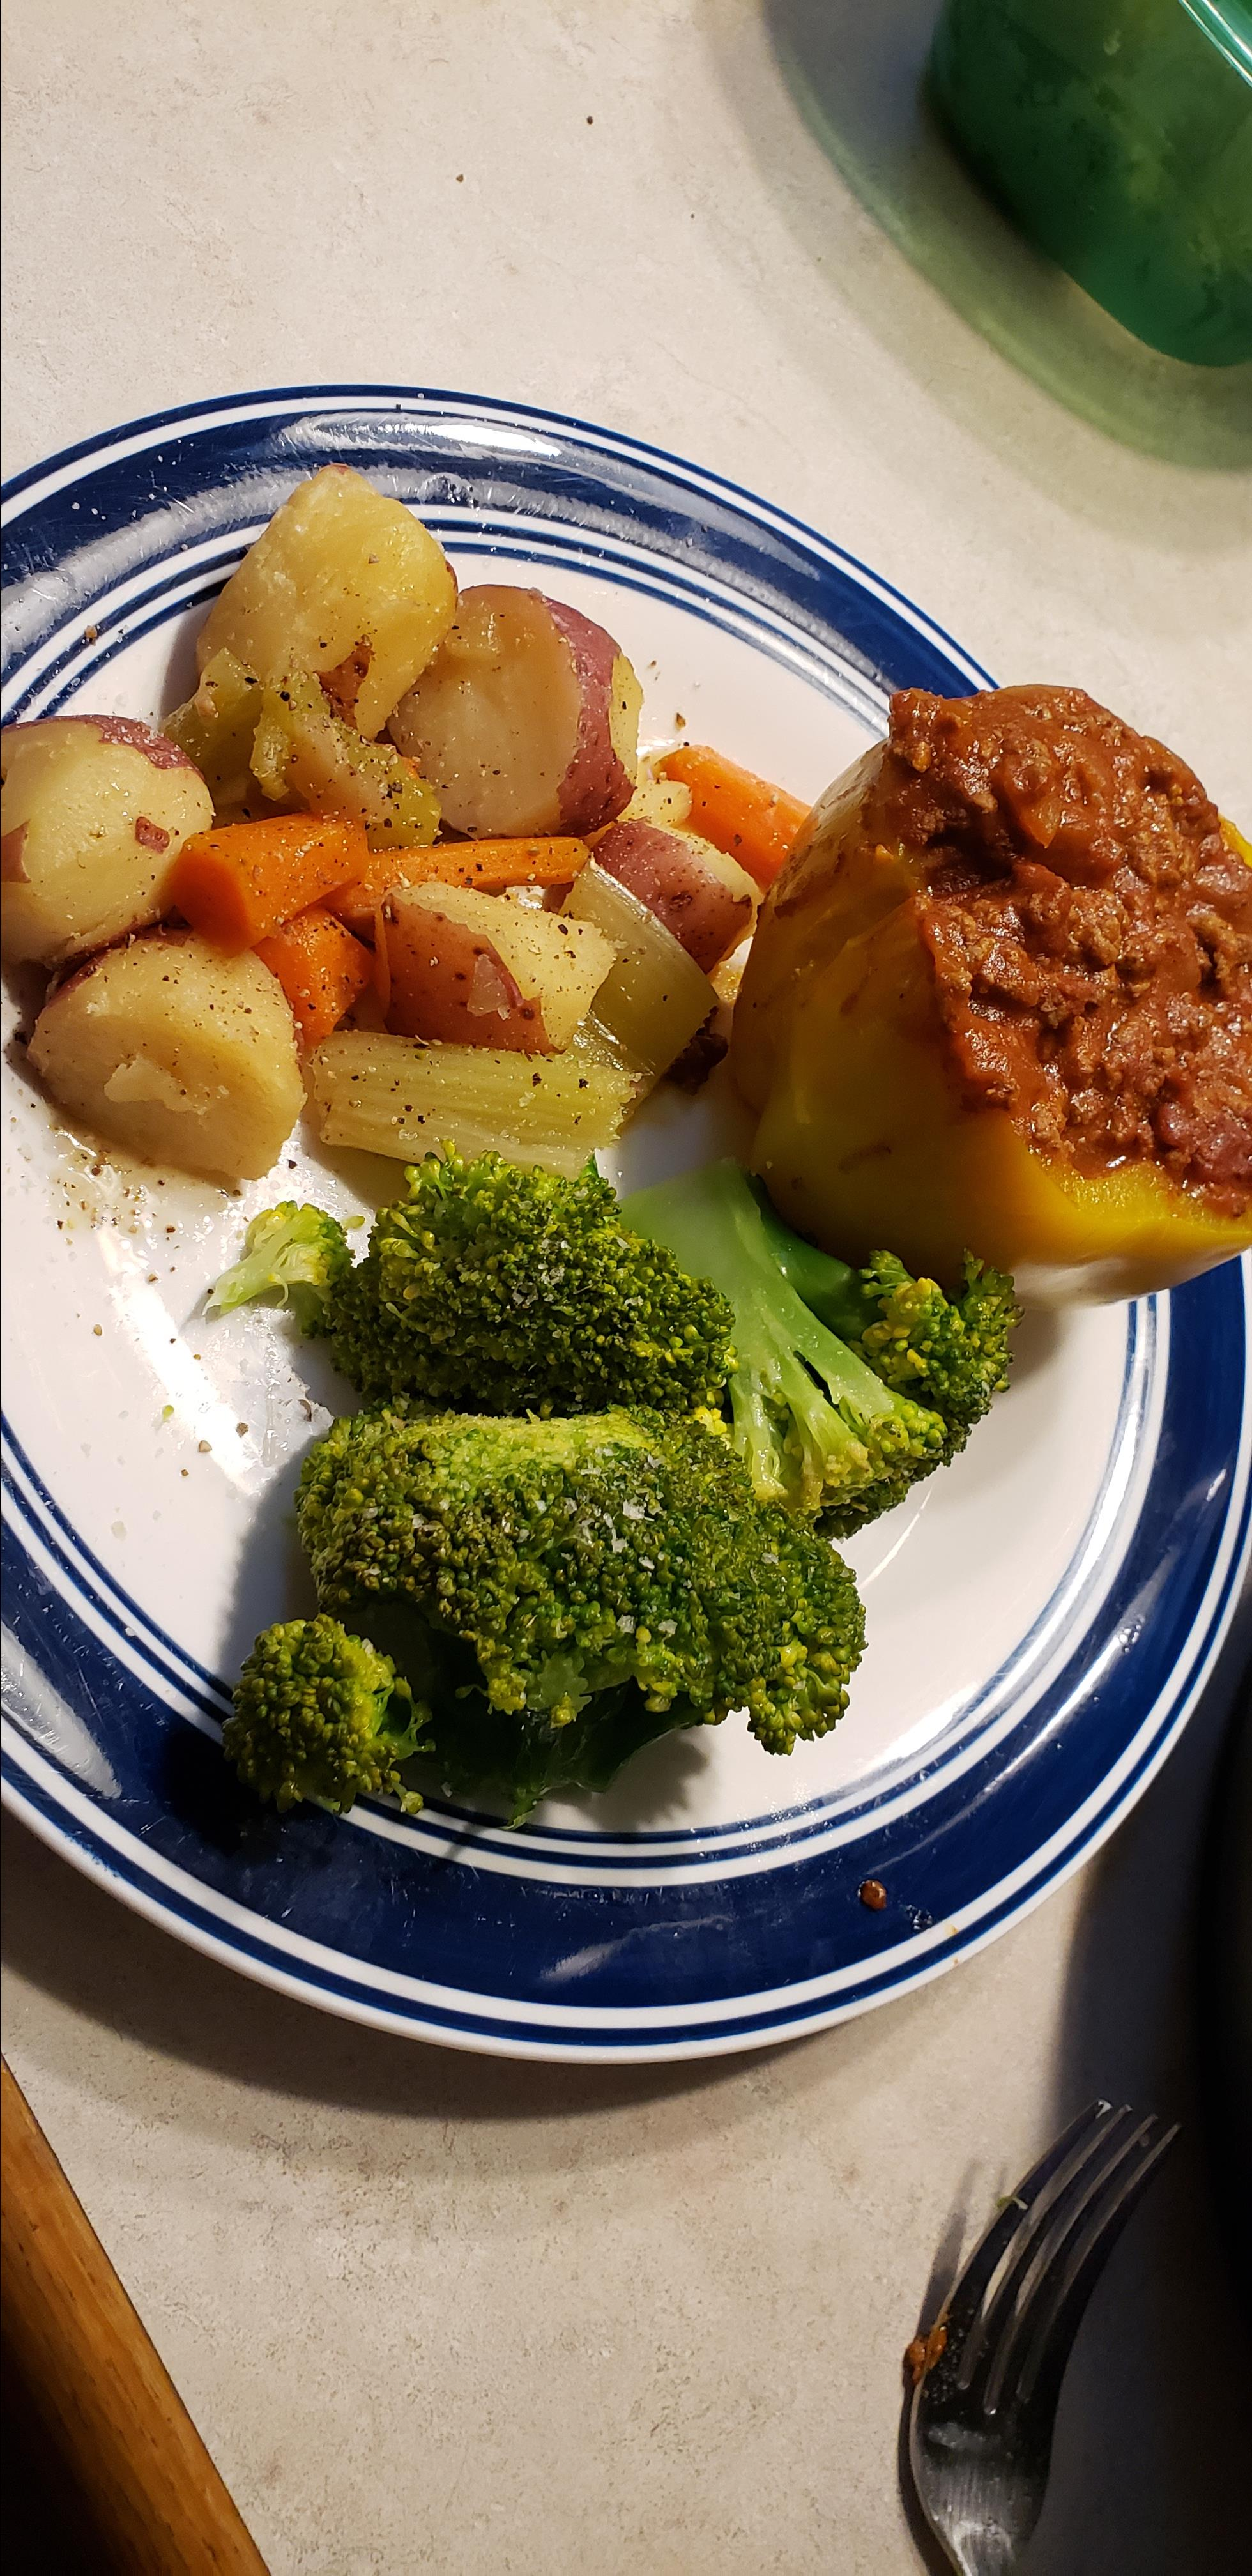 Instant Pot® Beef-Stuffed Peppers Susan Laurenz Jakubowski